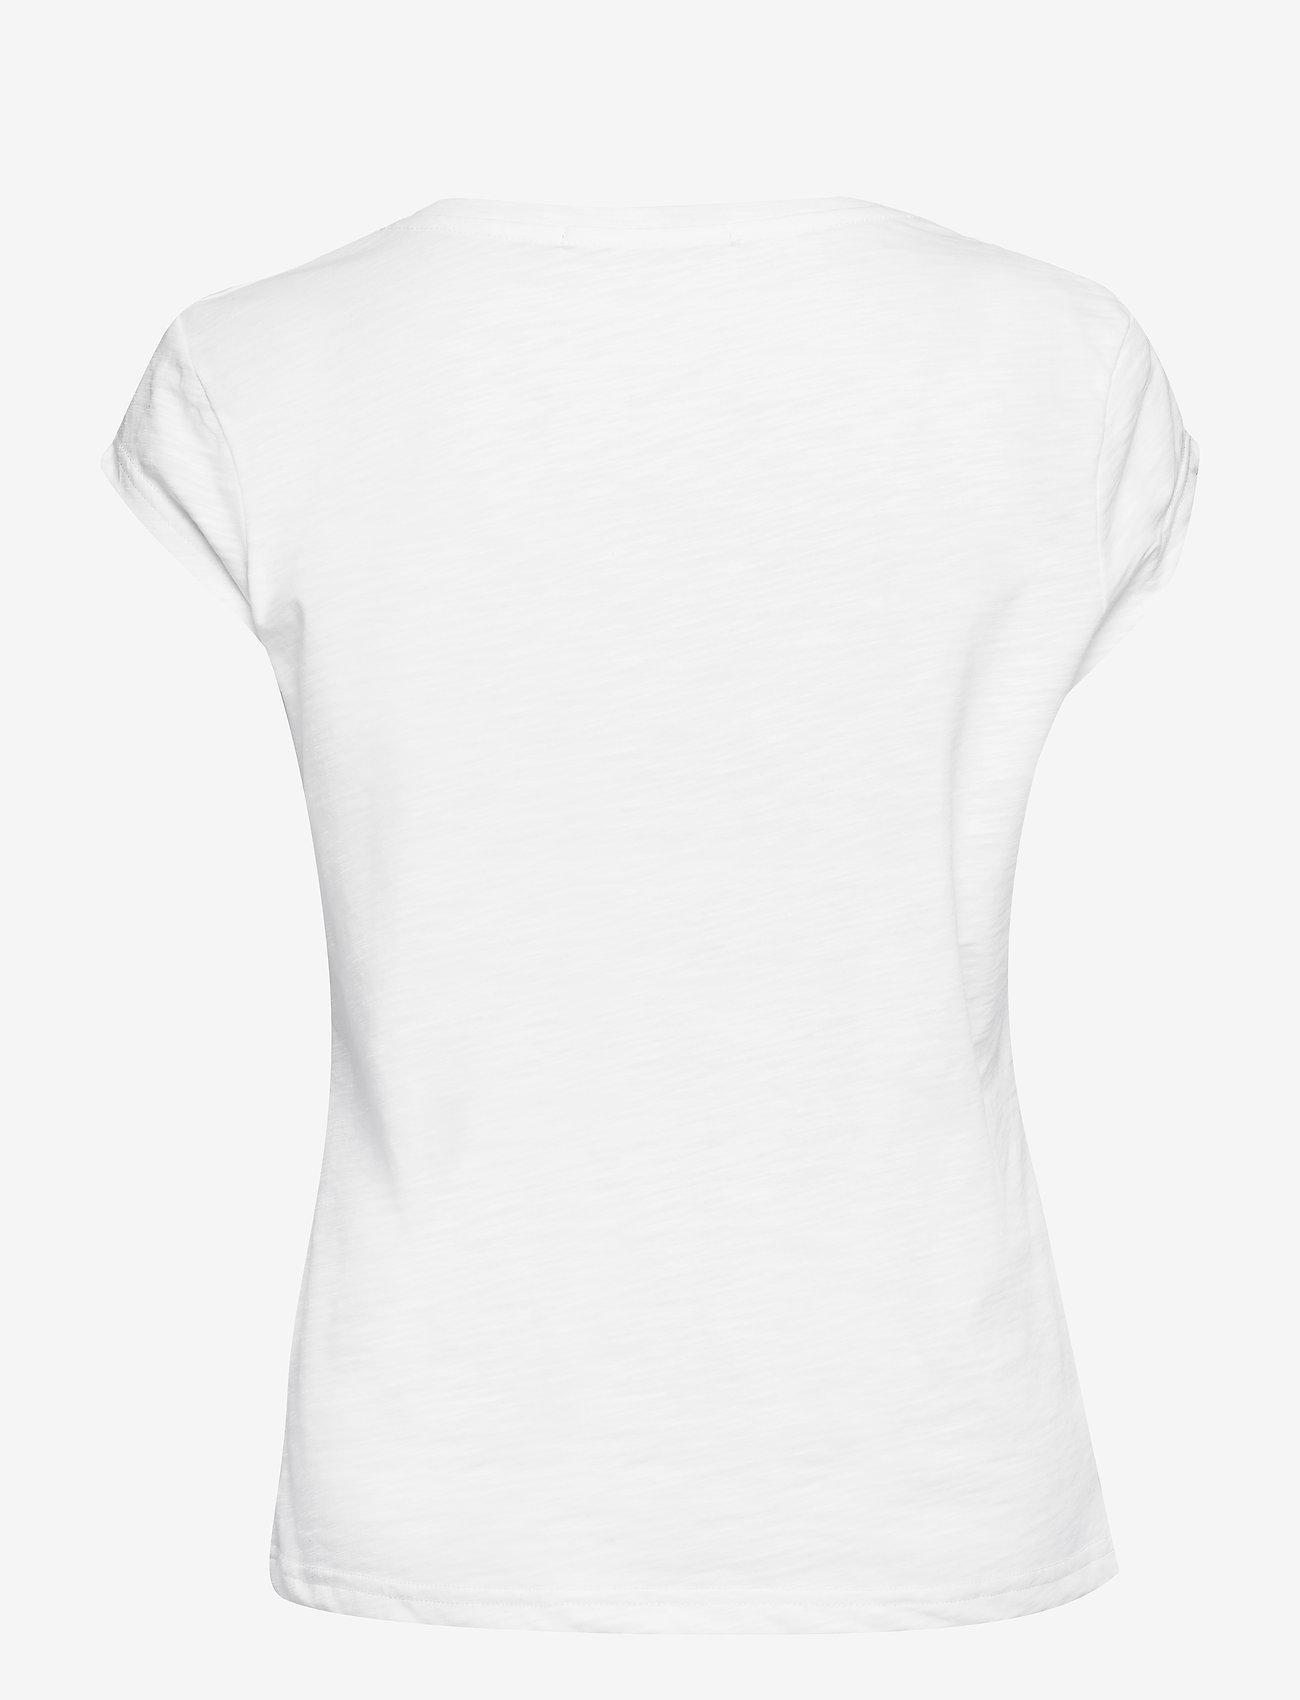 Coster Copenhagen - Basic tee w. v-neck - t-shirts - white - 1